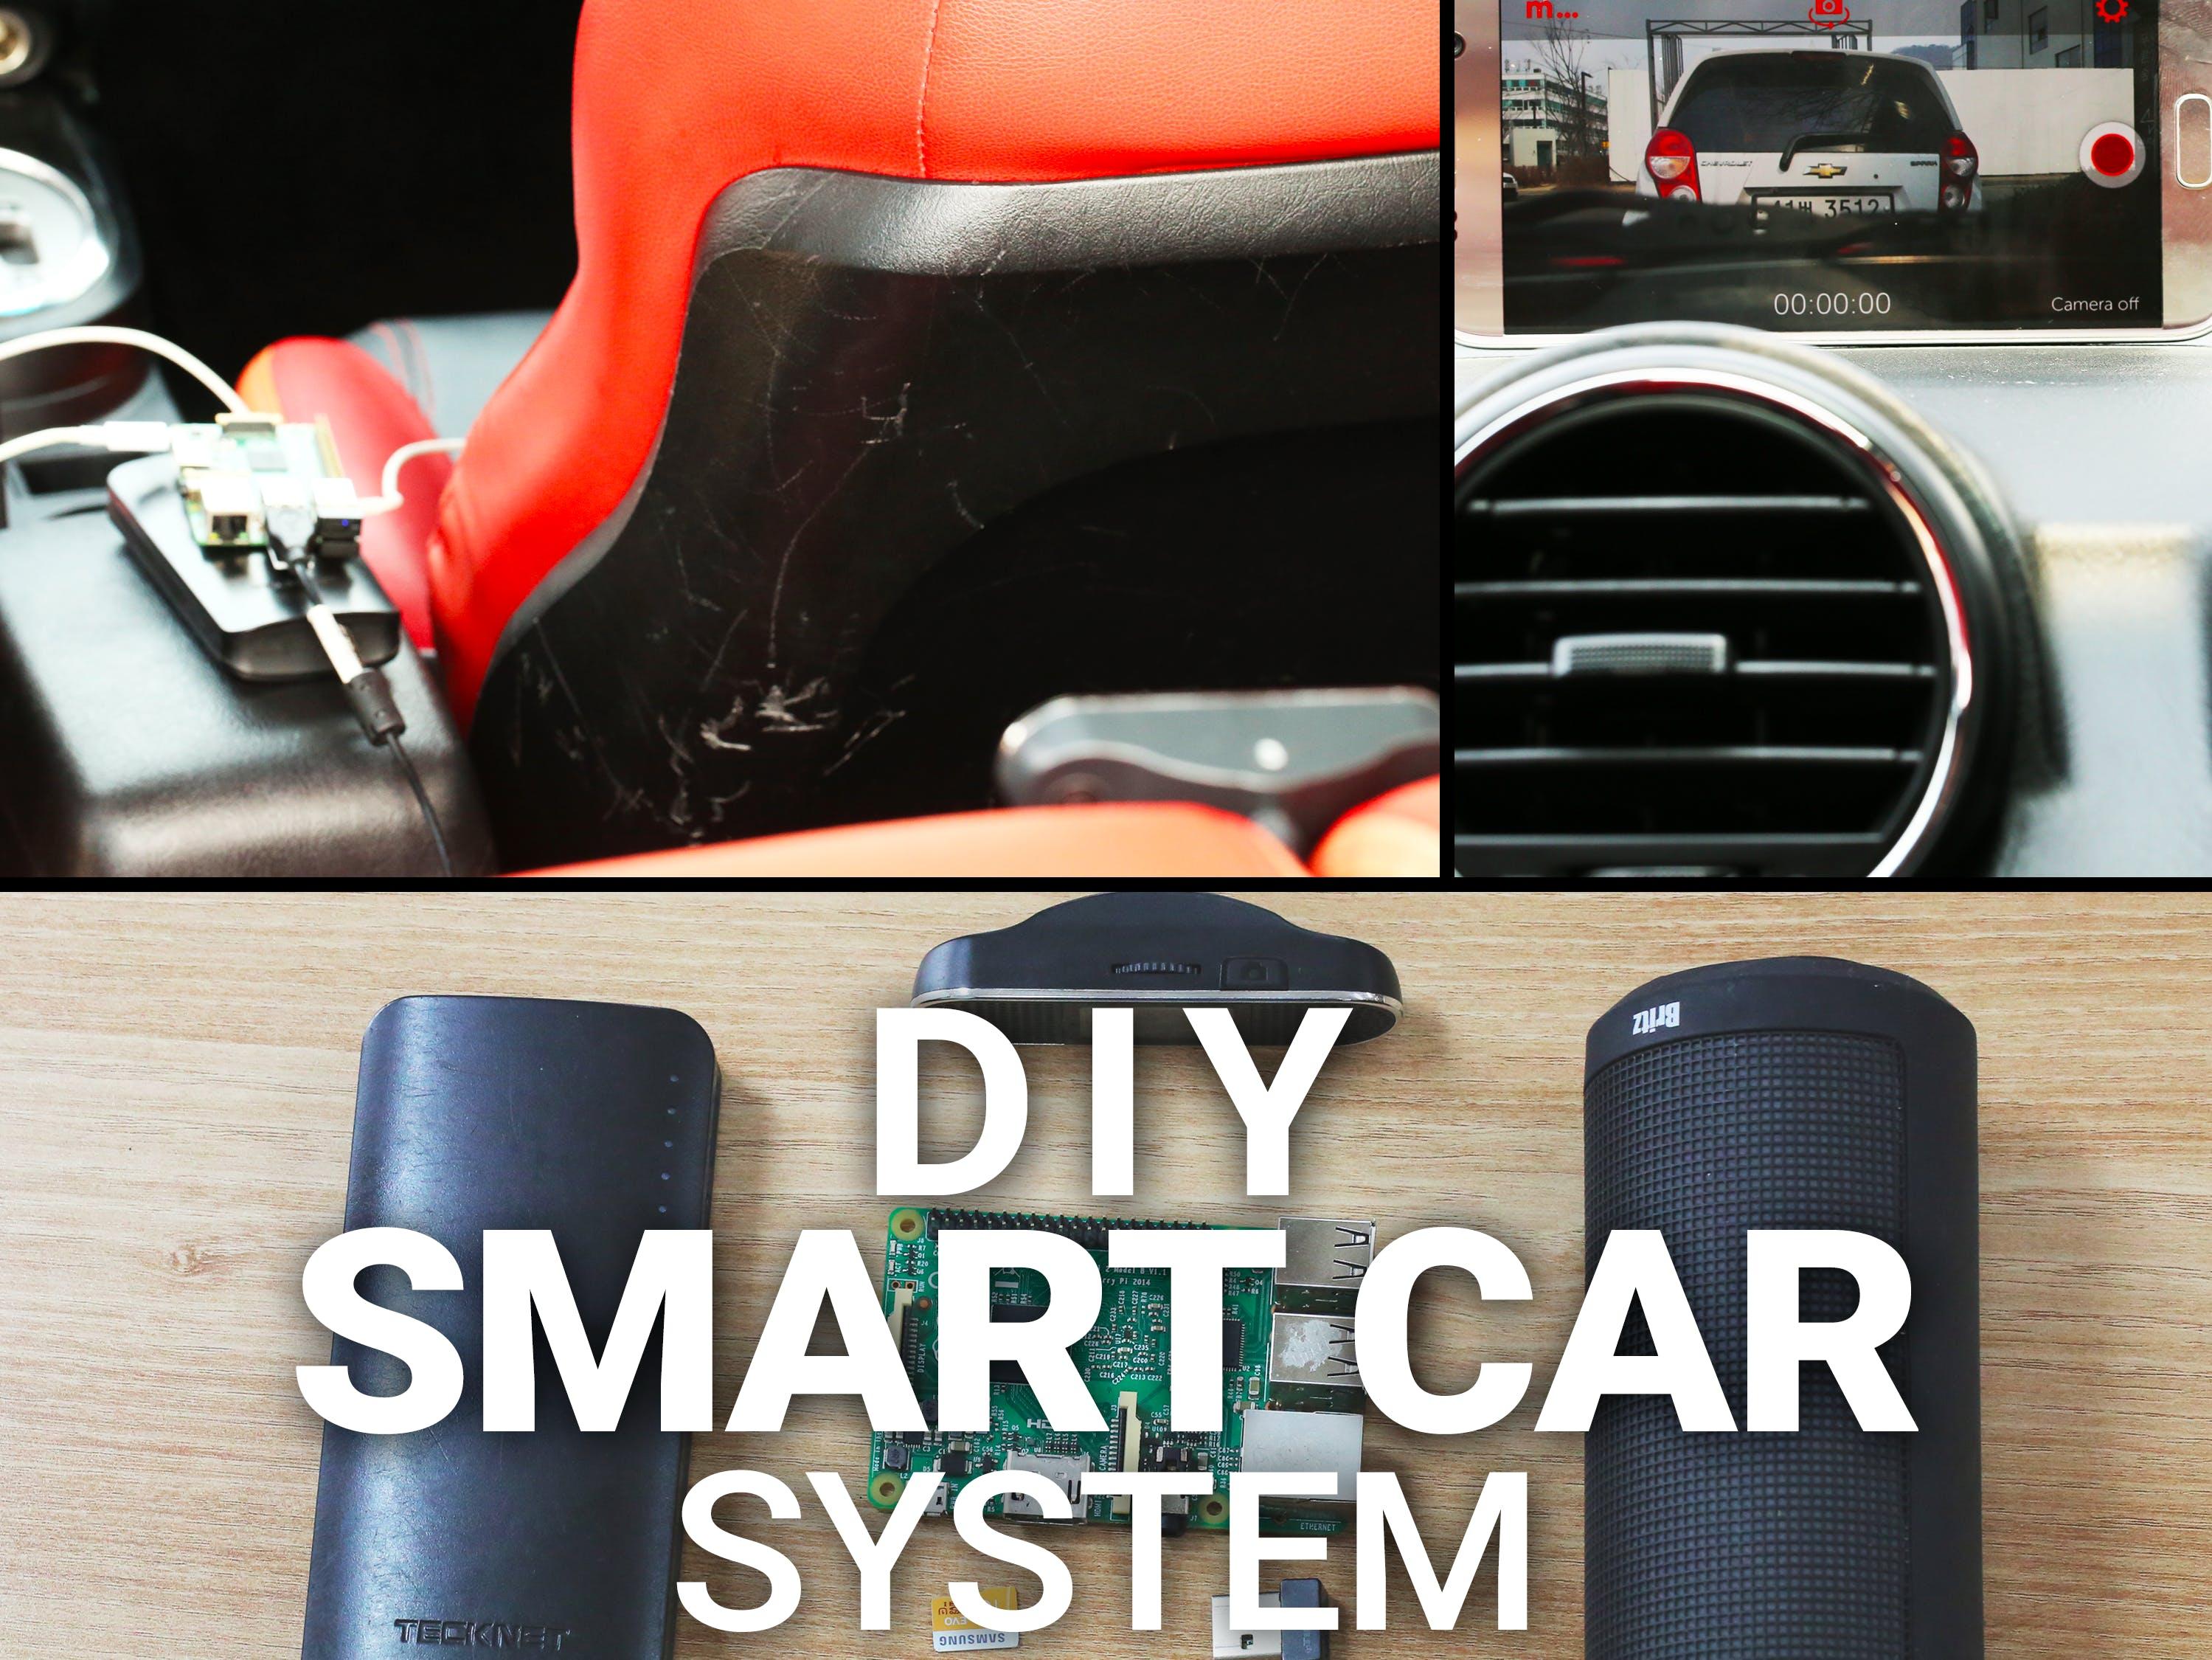 DIY Smart Car System